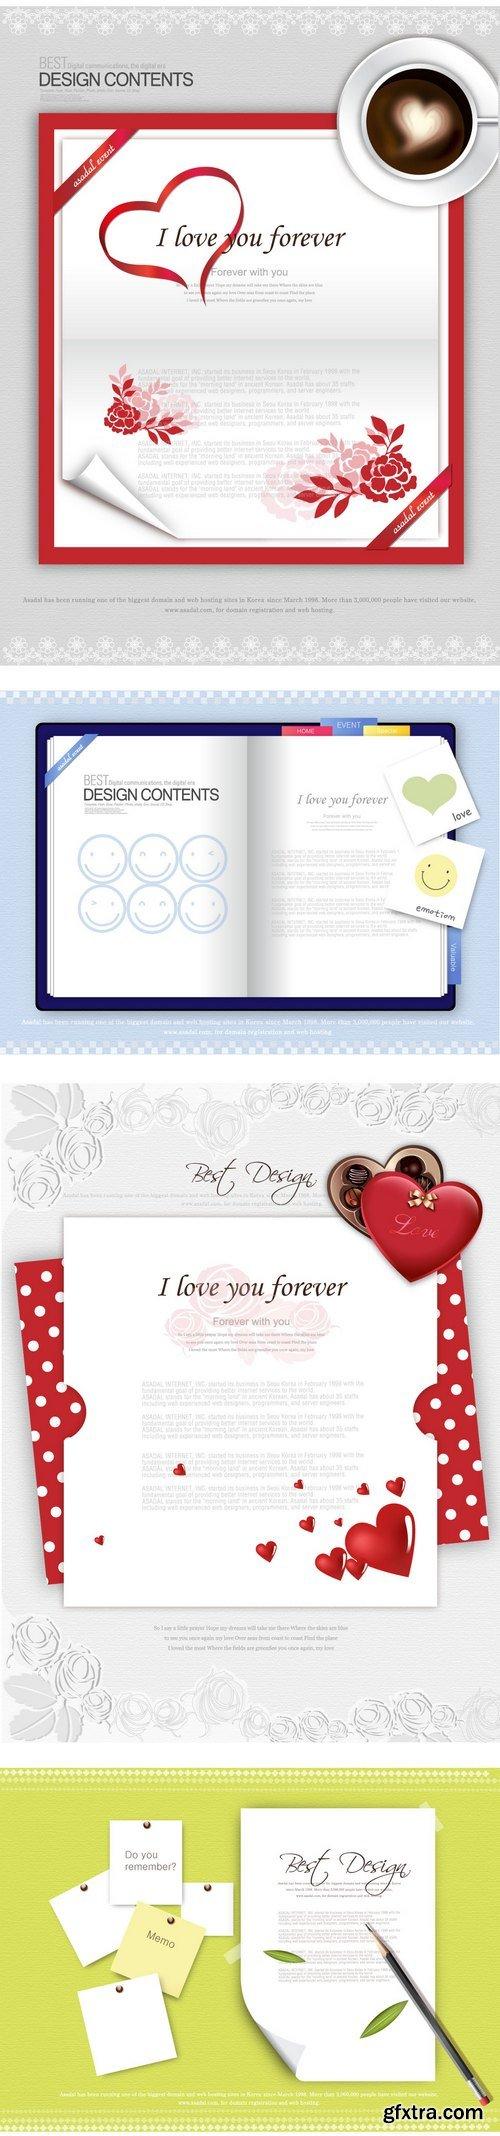 Romantic and love theme 2